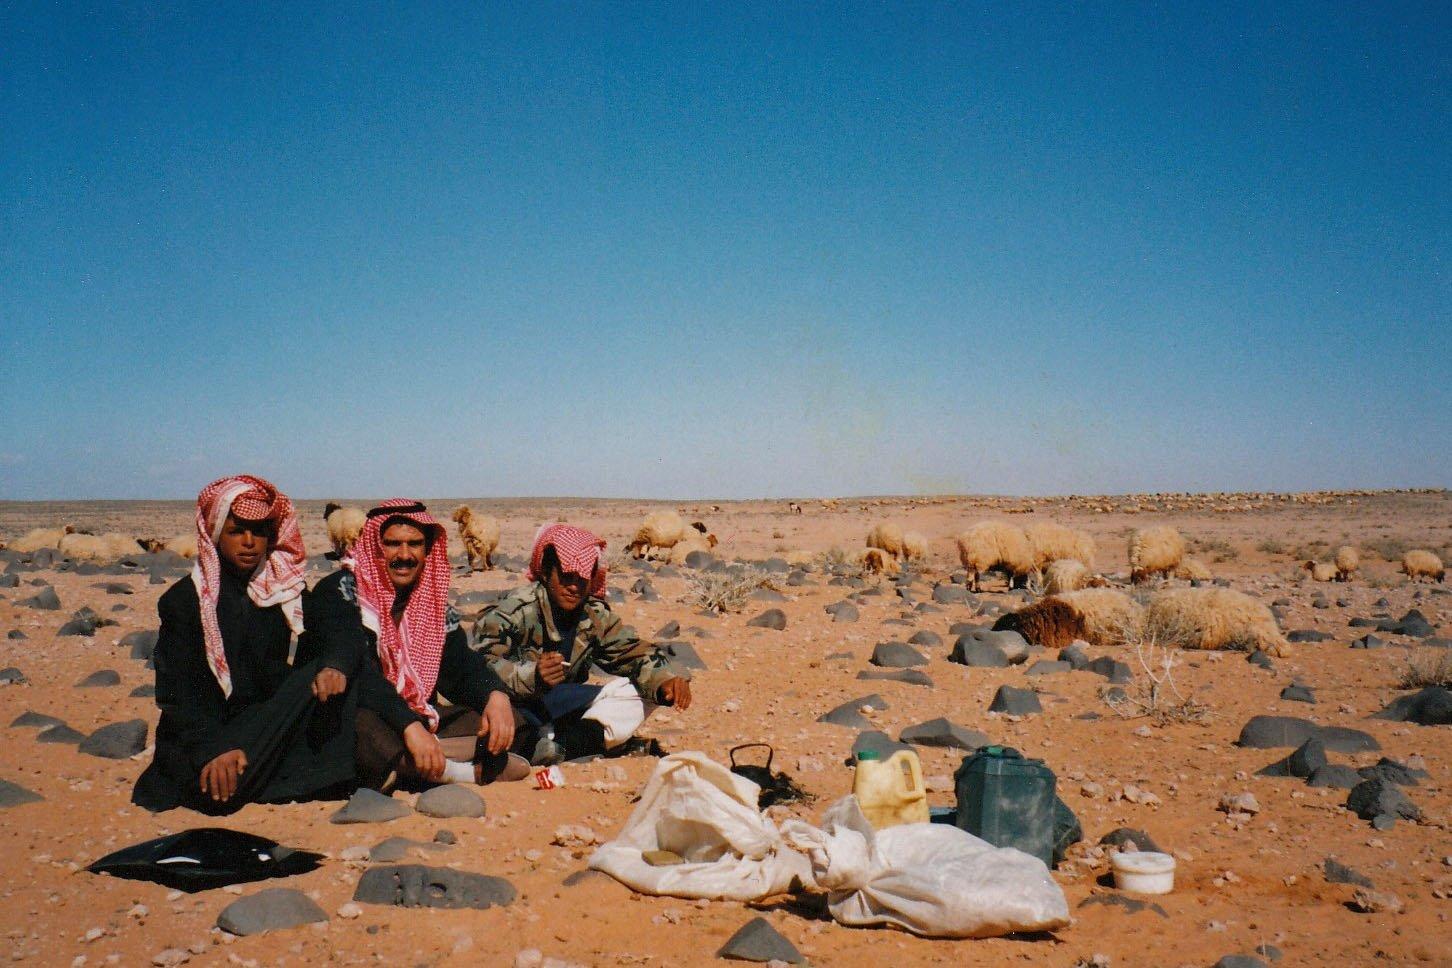 IMF in Jordan